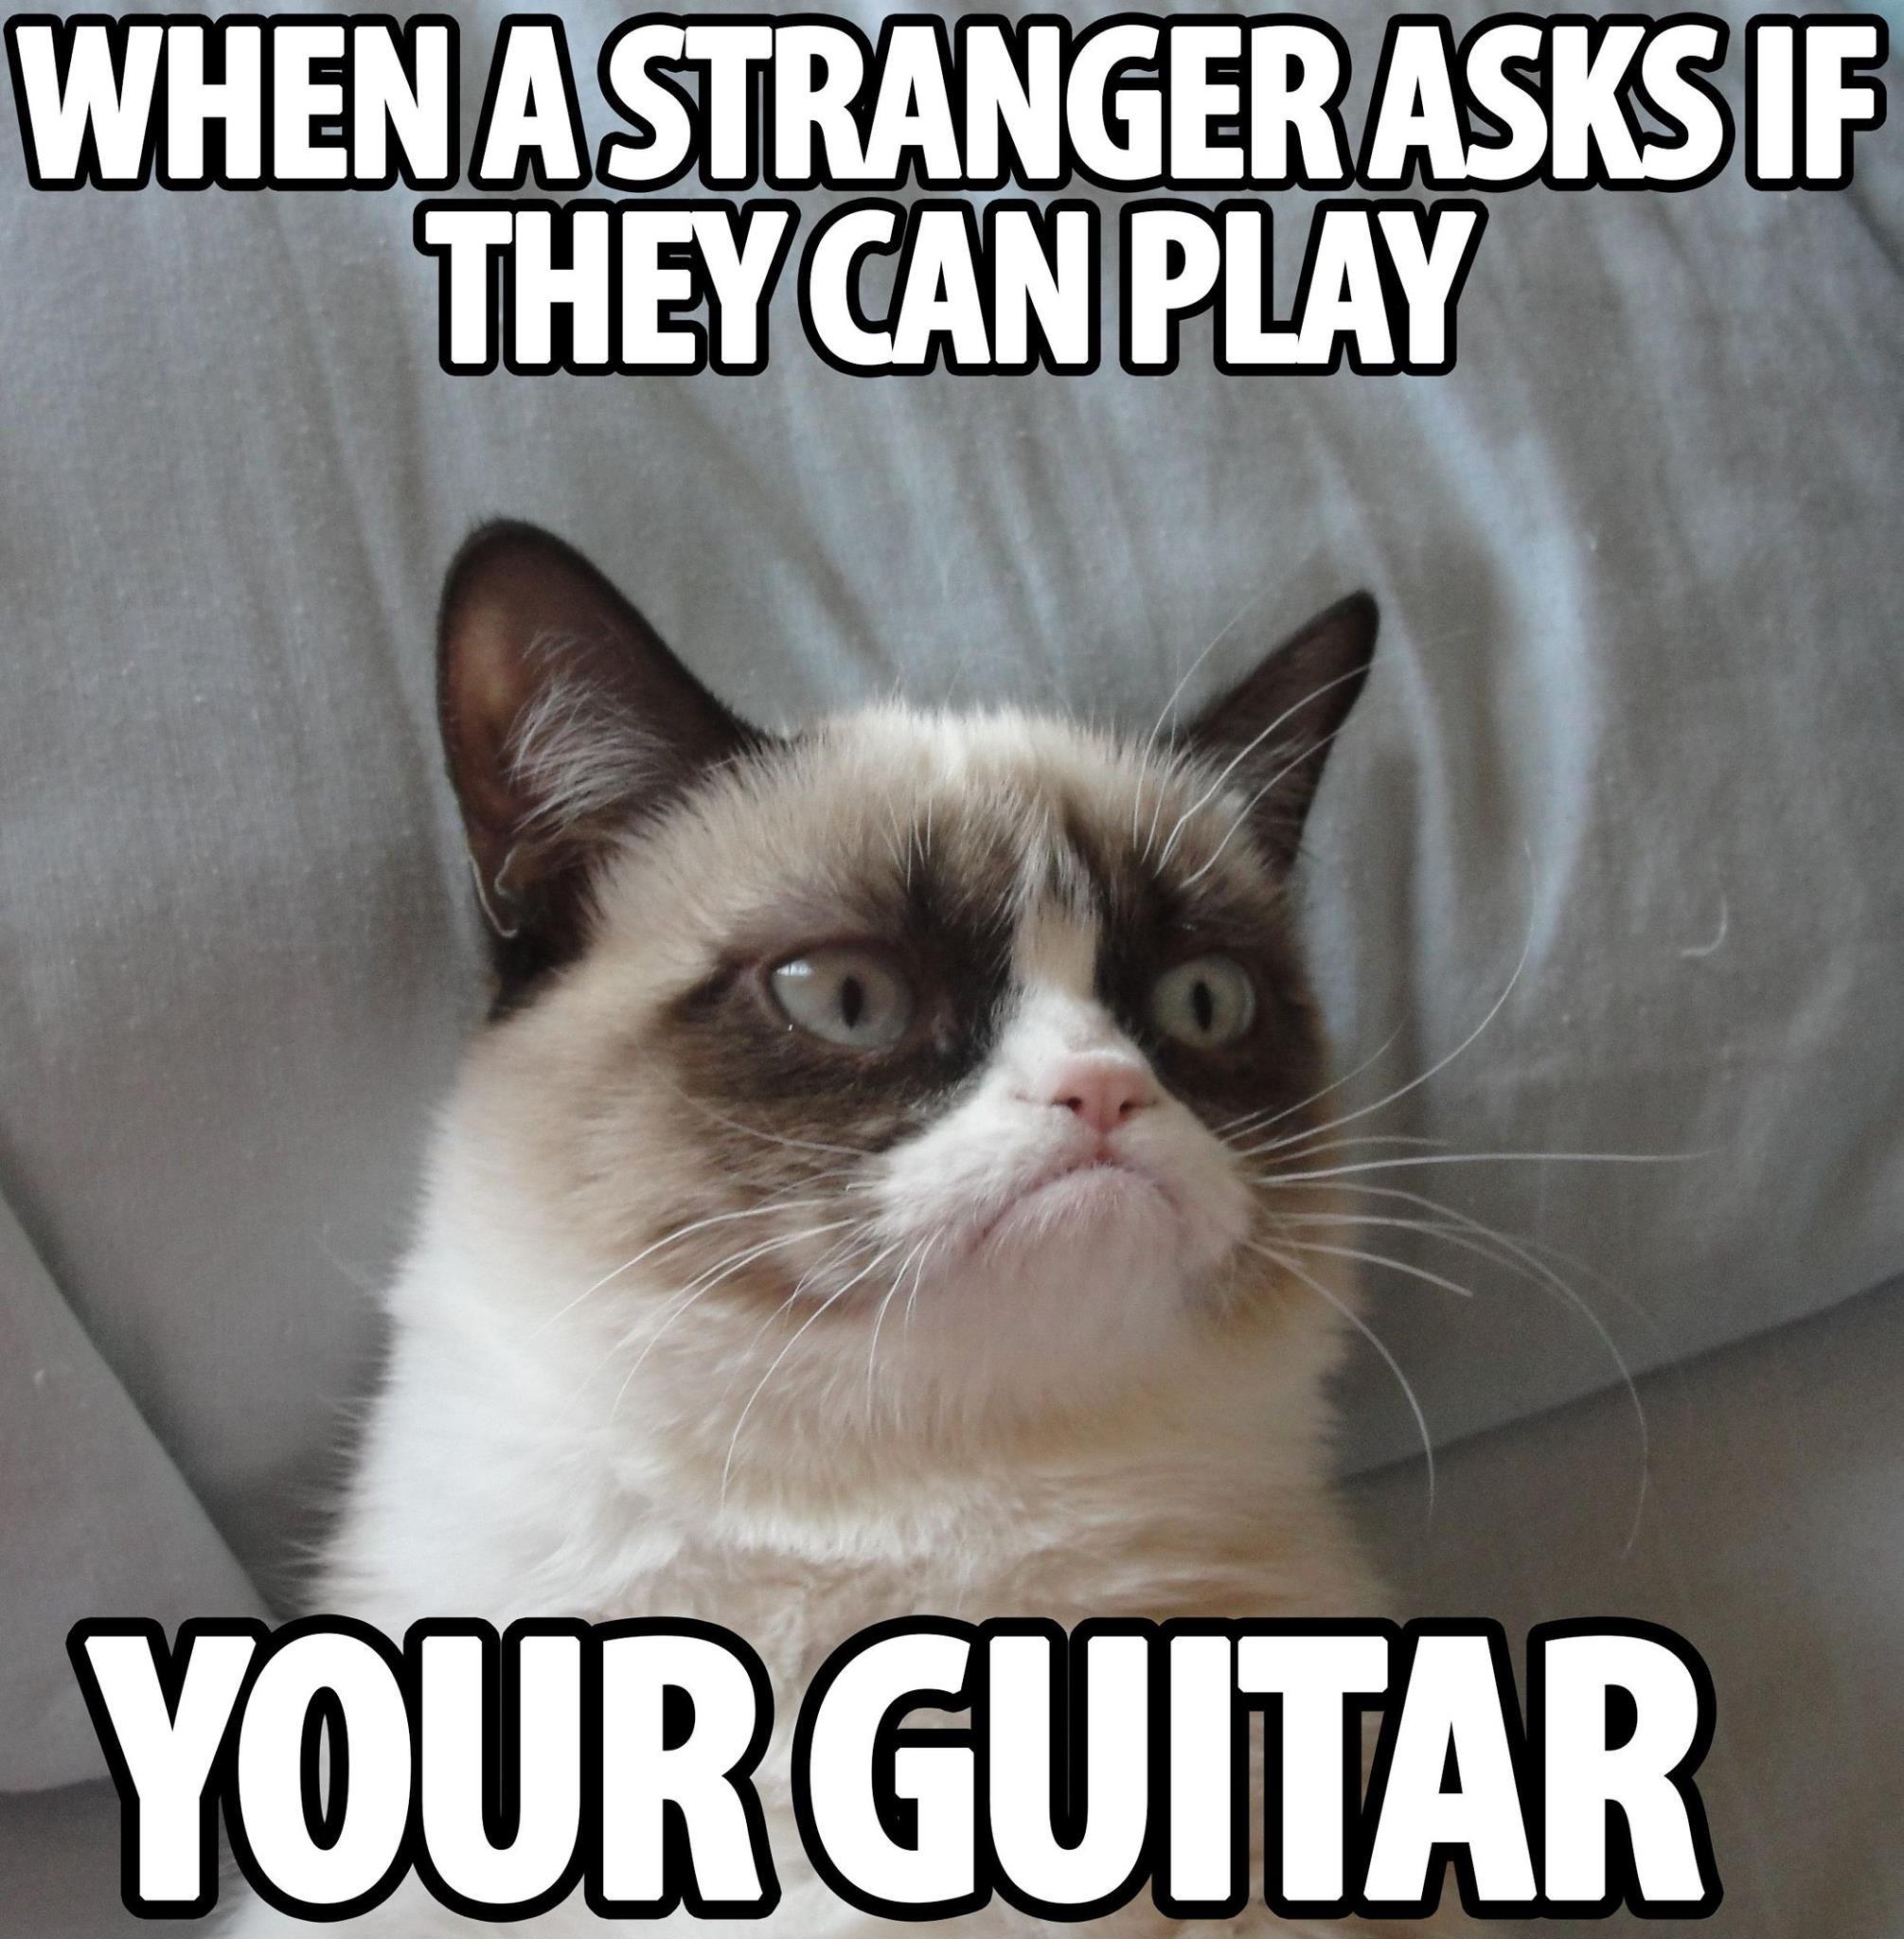 4d827c893b047b009d2a1d669923017b grumpycat meow guitars meme music addicted animals,Meow Meme